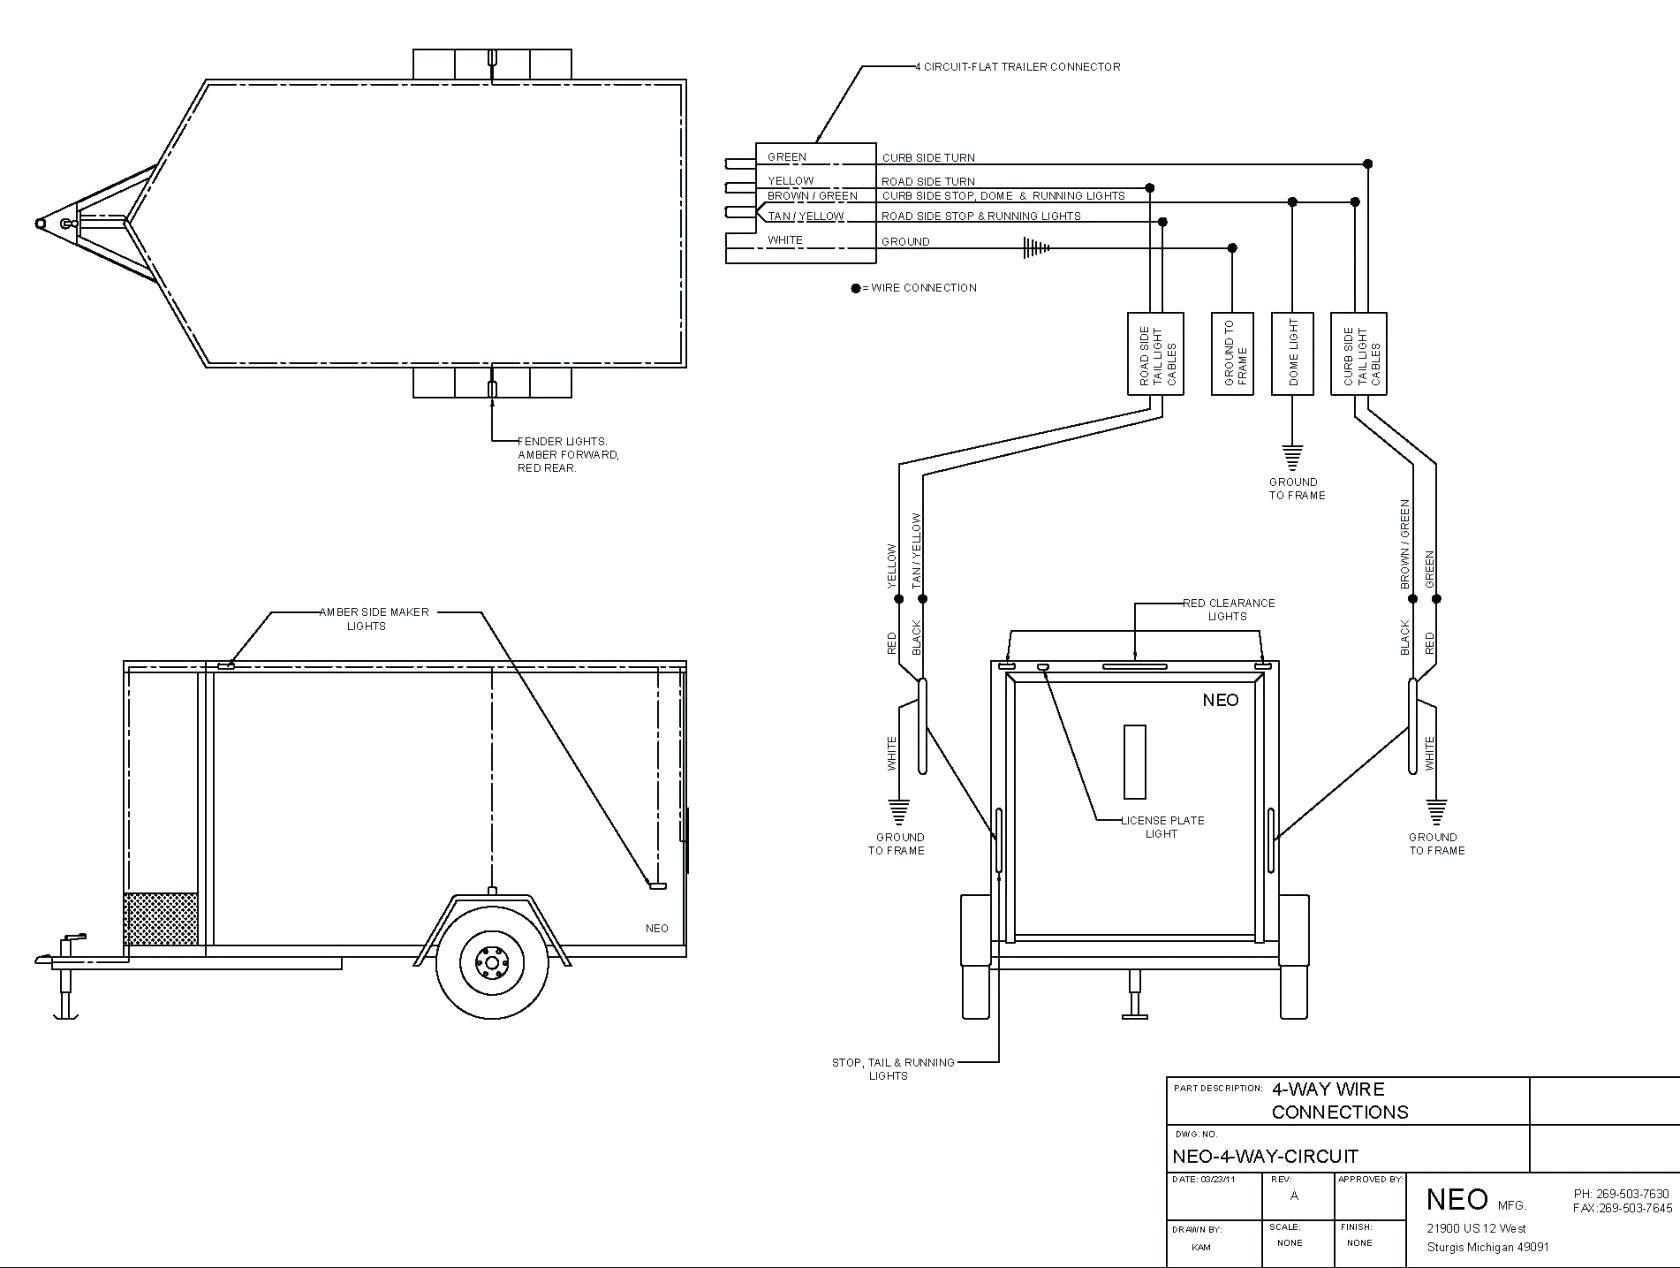 hawke dump trailer wiring diagram Download-Dump Trailer Wiring Diagram  Fresh Moritz Dump Trailer Wiring. DOWNLOAD. Wiring Diagram ...